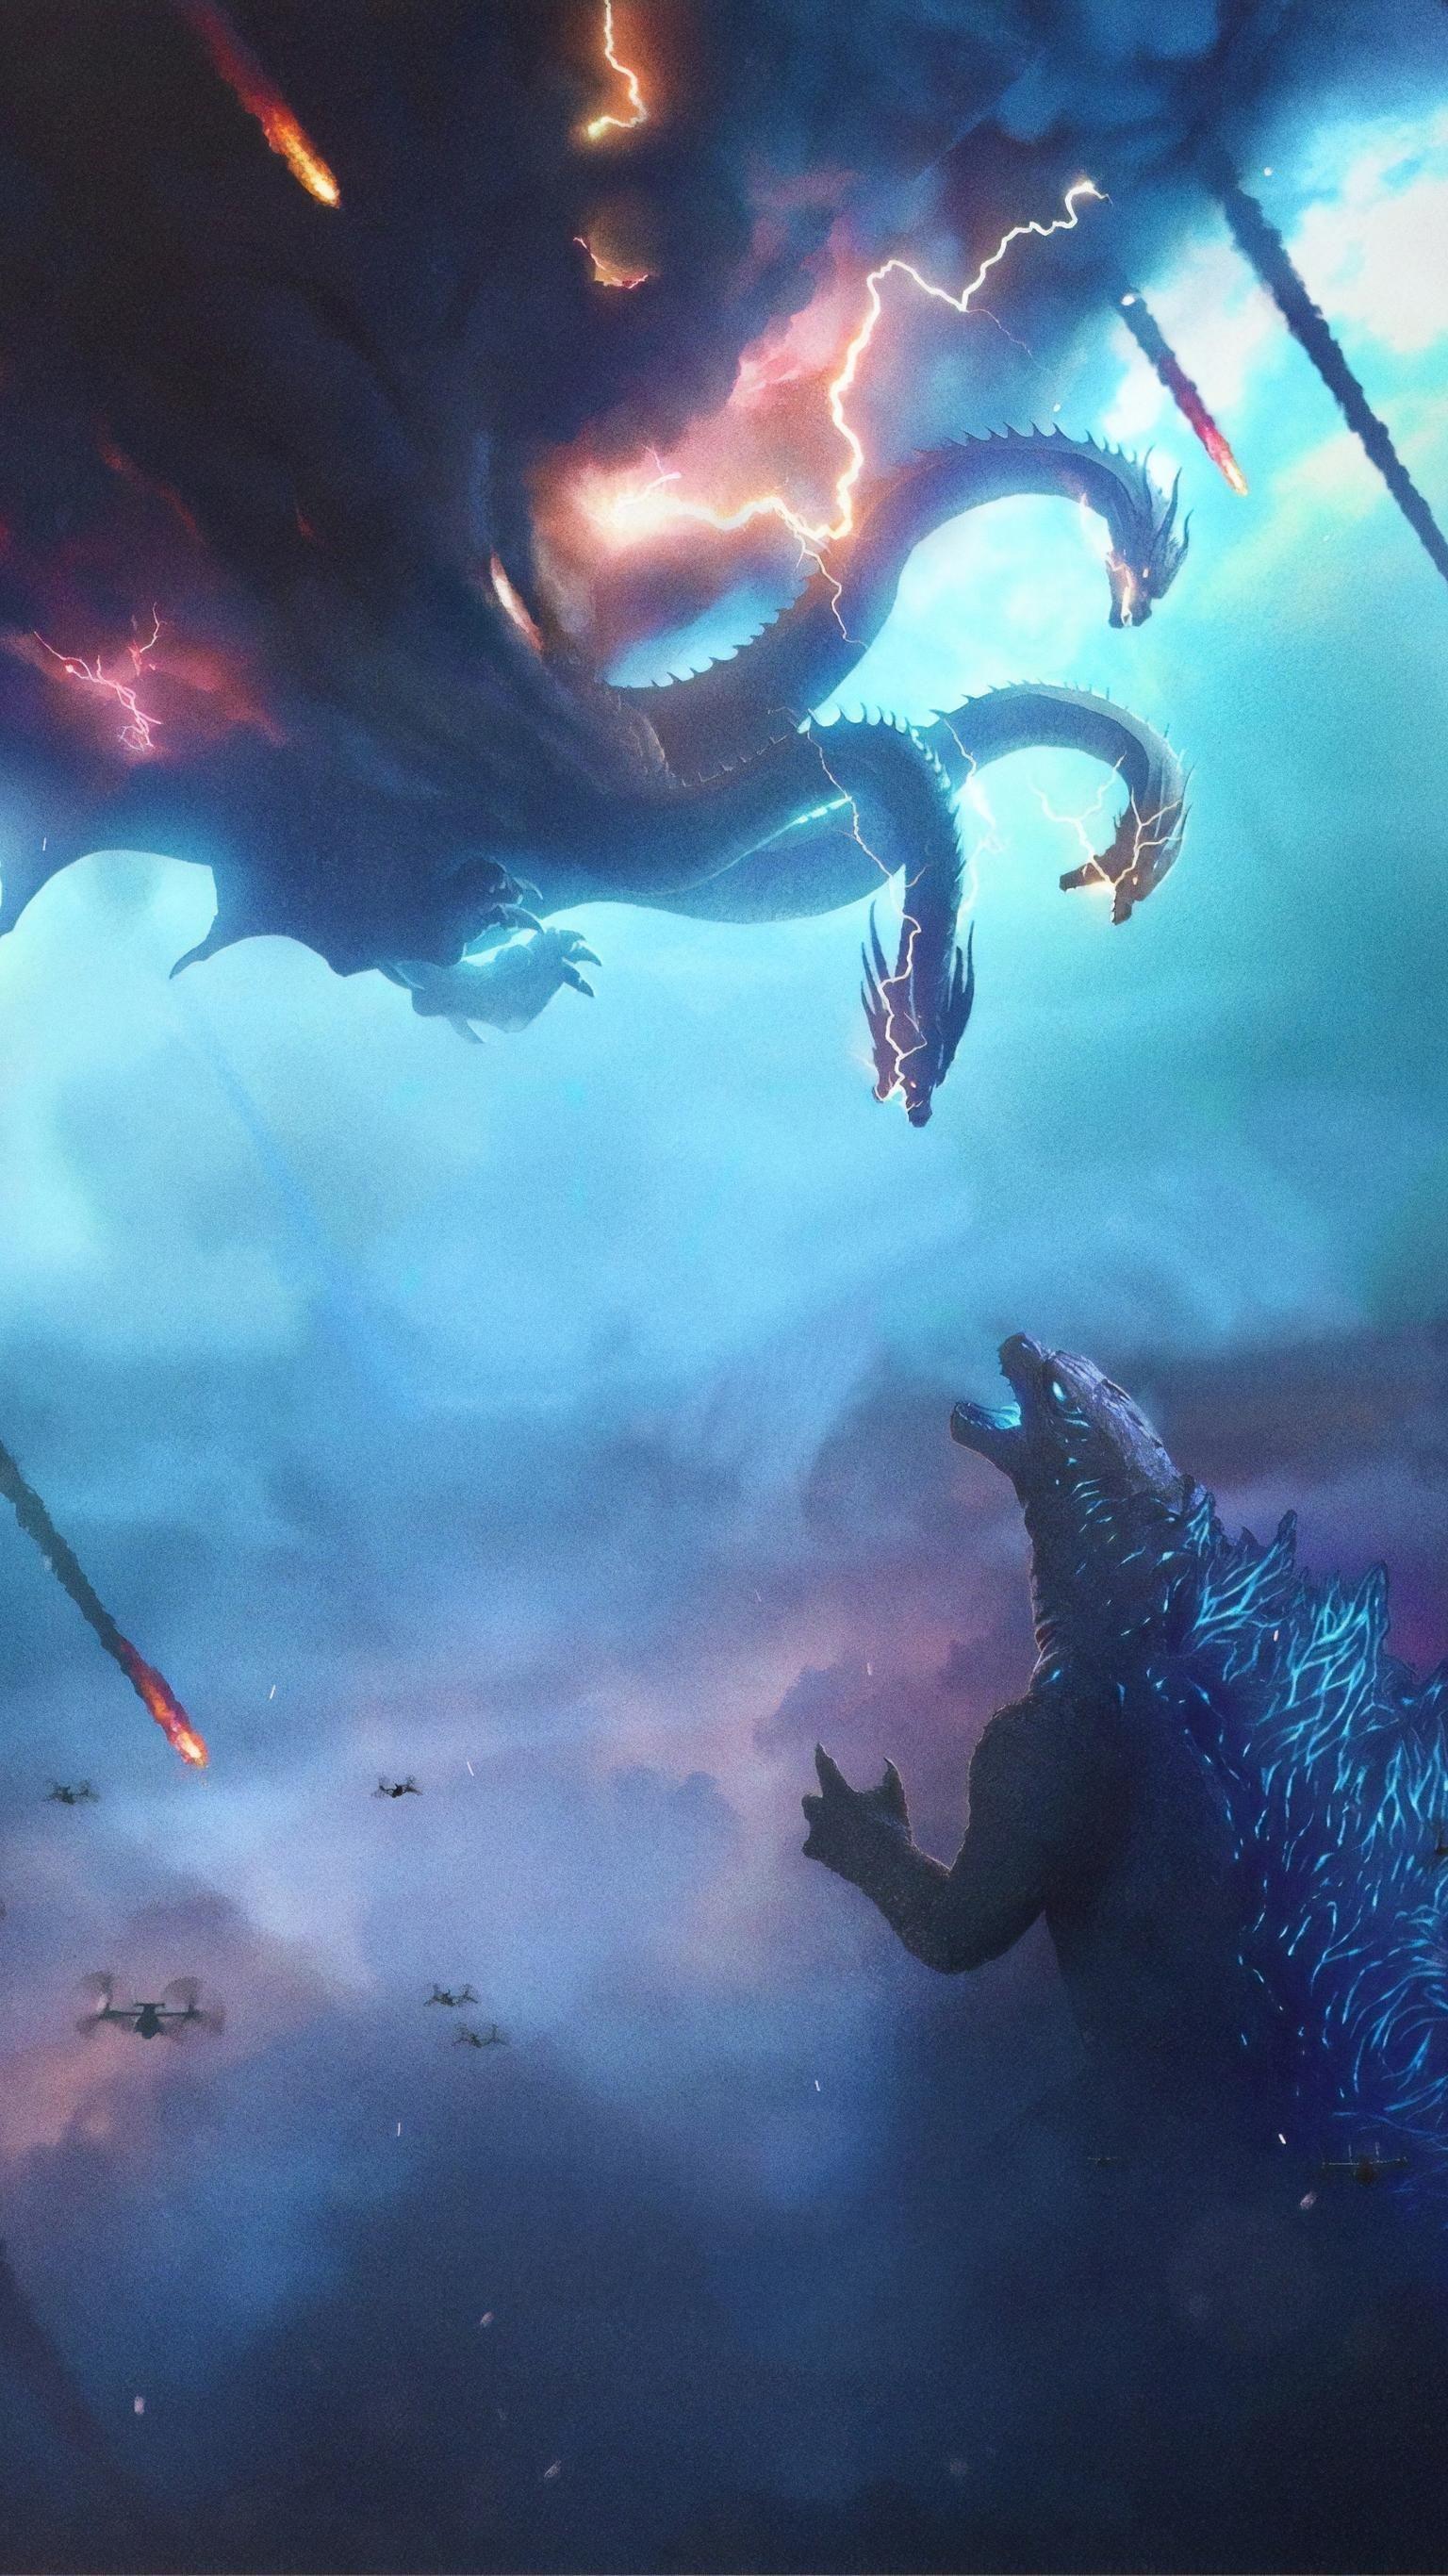 Godzilla King Of The Monsters 2019 Phone Wallpaper Moviemania Godzilla Wallpaper Godzilla Funny Godzilla Comics